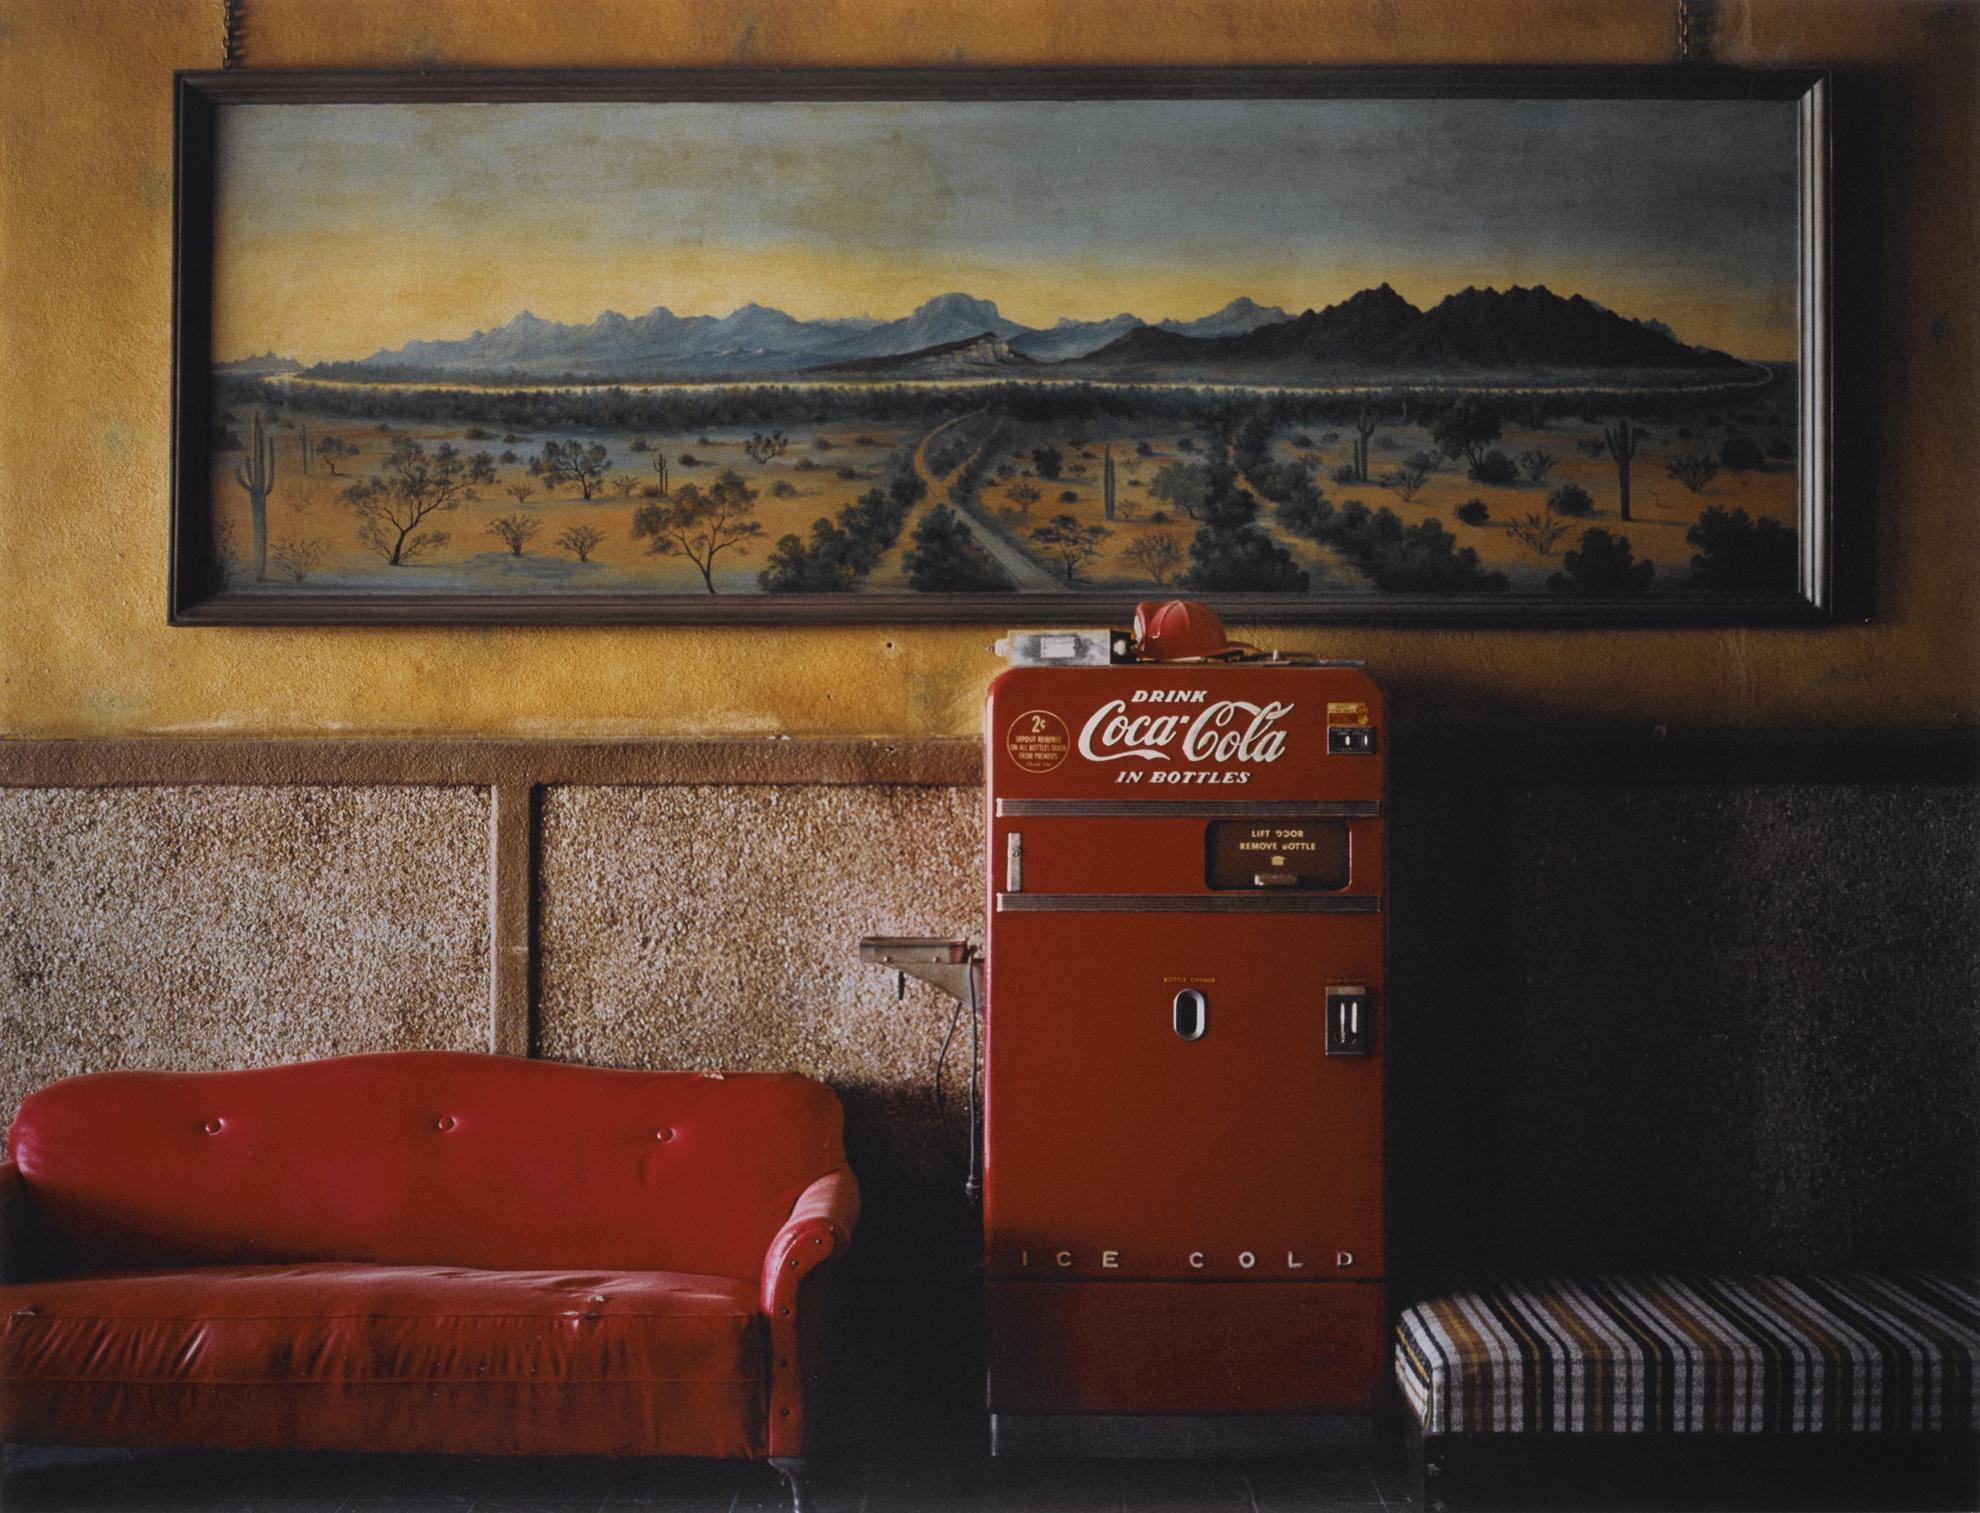 Wim Wenders-Lounge Painting #1 Gila Bend, Arizona-1983